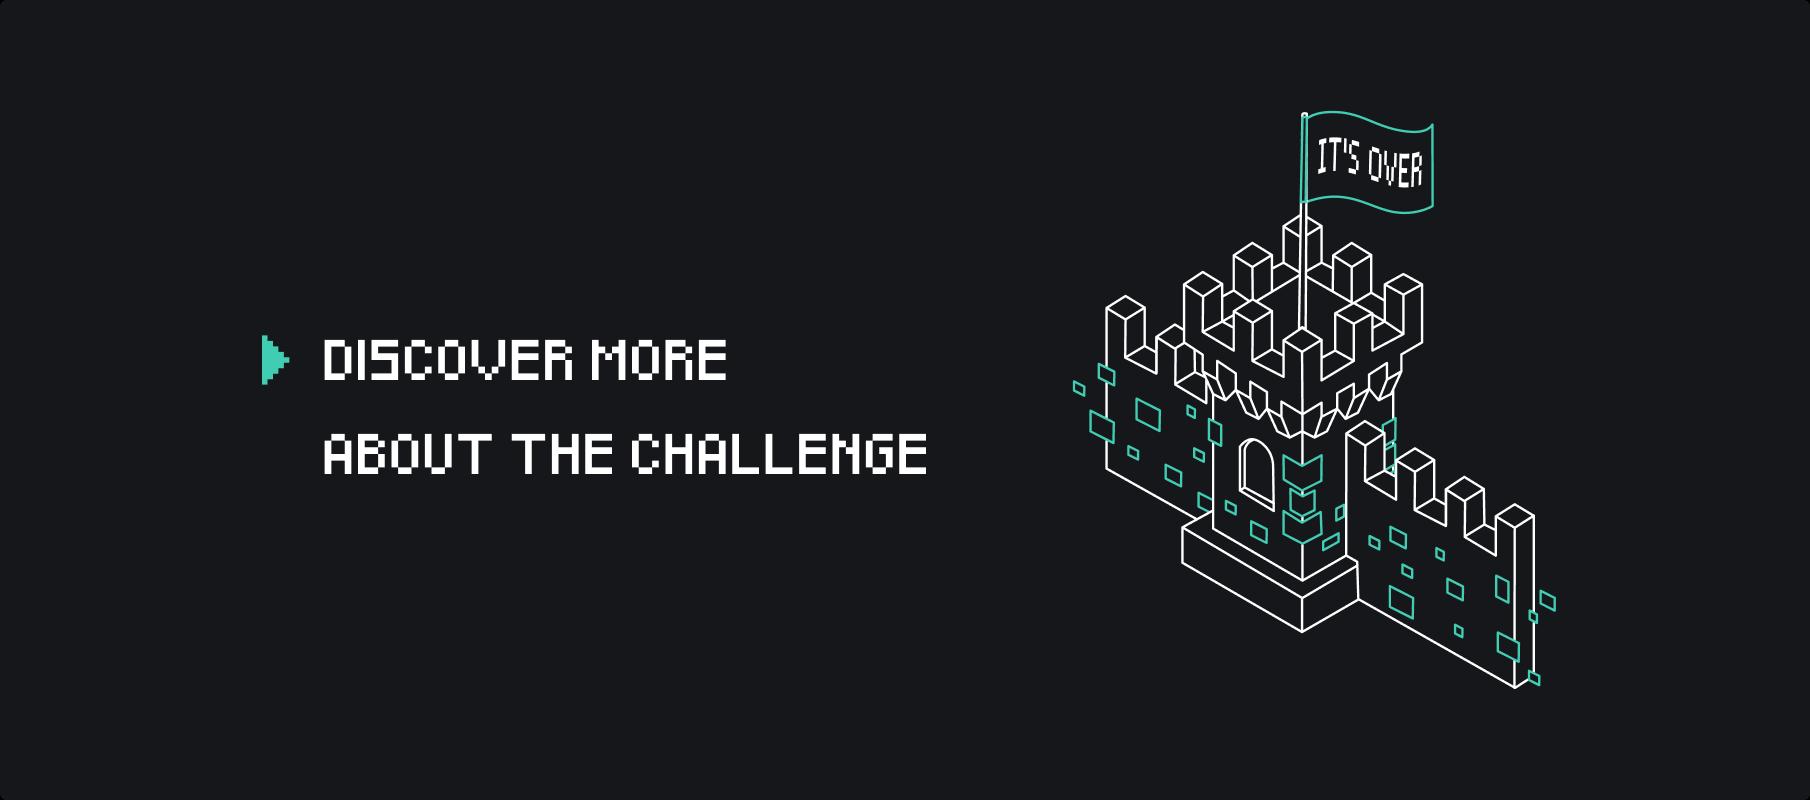 Ledger Donjon Capture the flag CTF challenge recap crypto